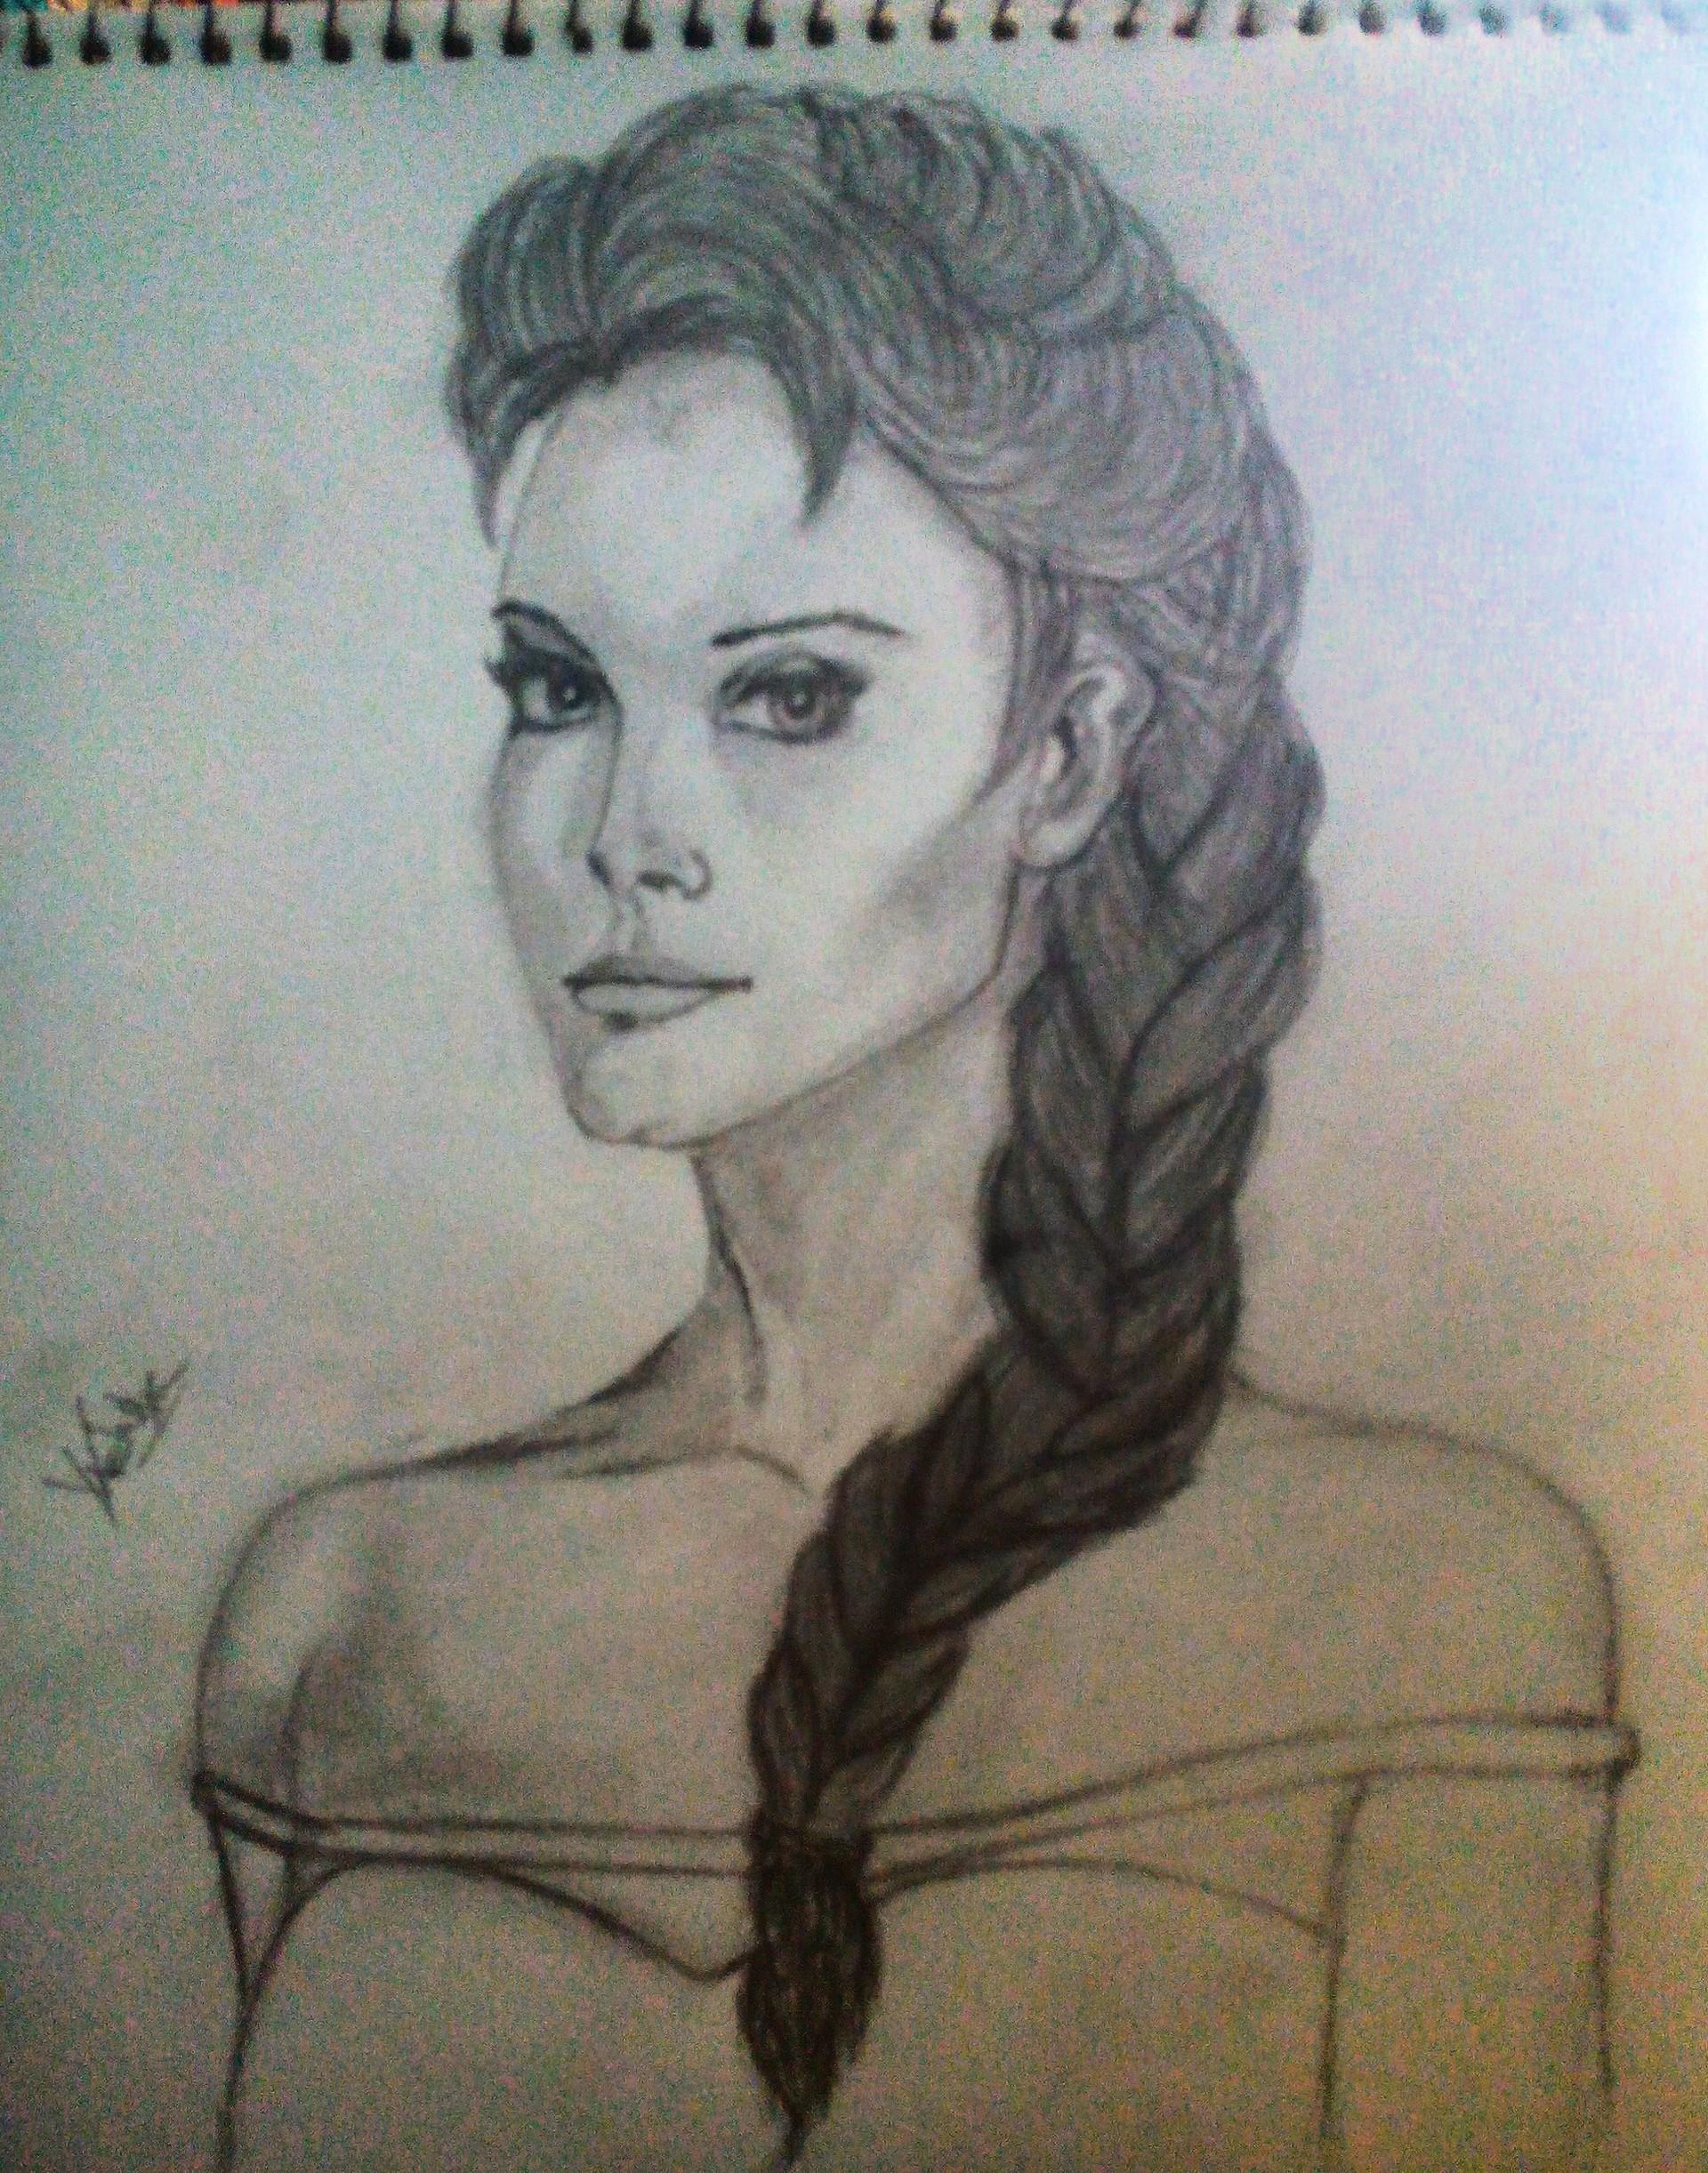 Vishal solanki beautiful girl pencil sketch